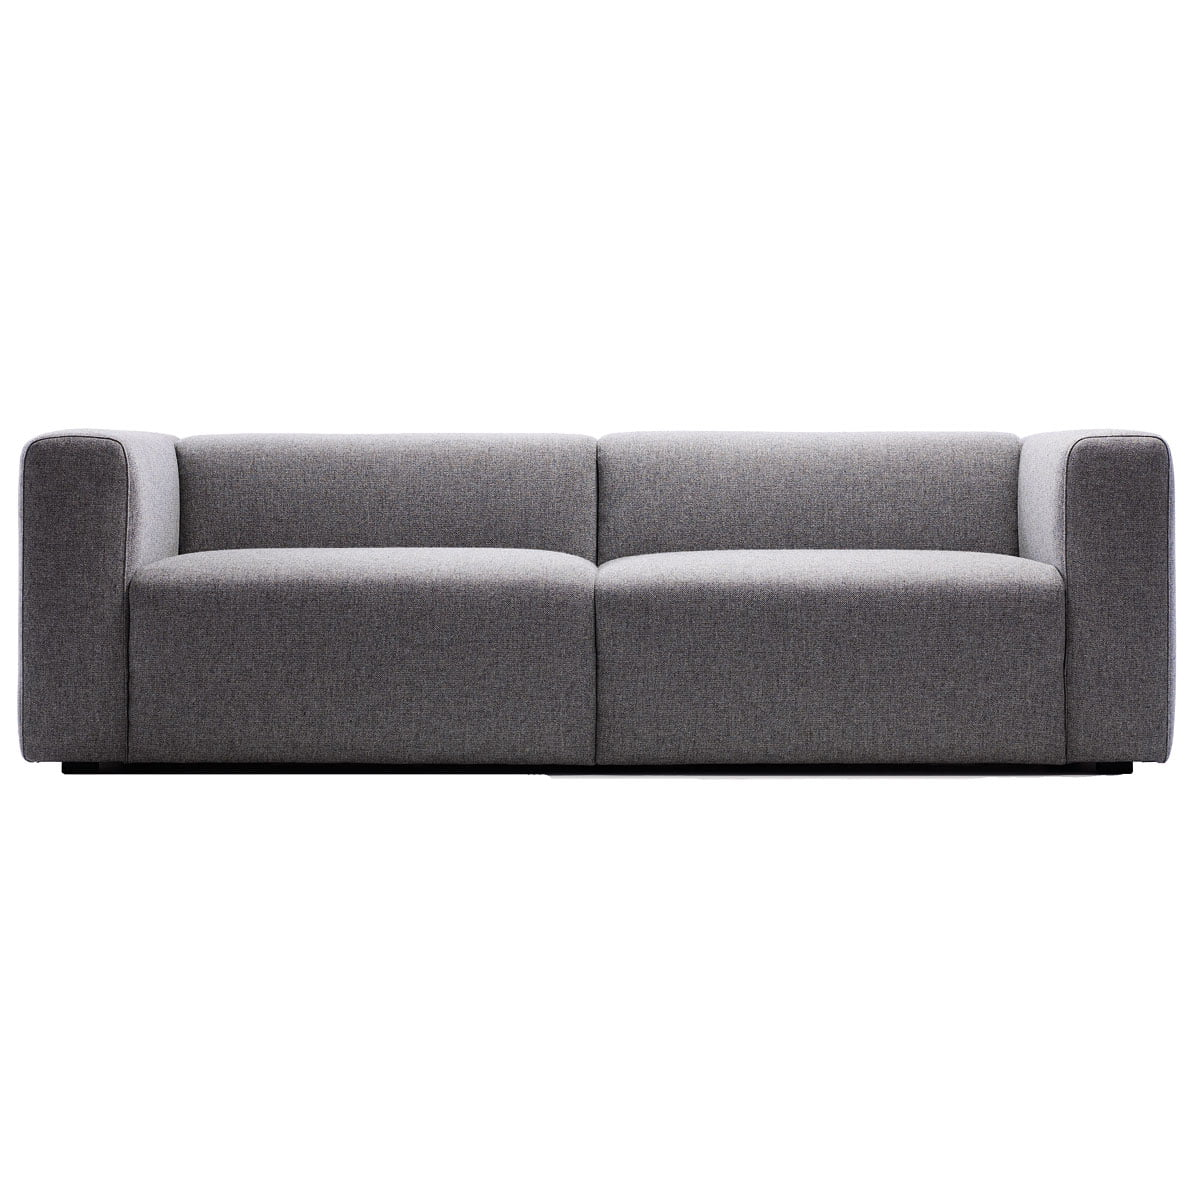 mags sofa 2 5 sitzer von hay. Black Bedroom Furniture Sets. Home Design Ideas